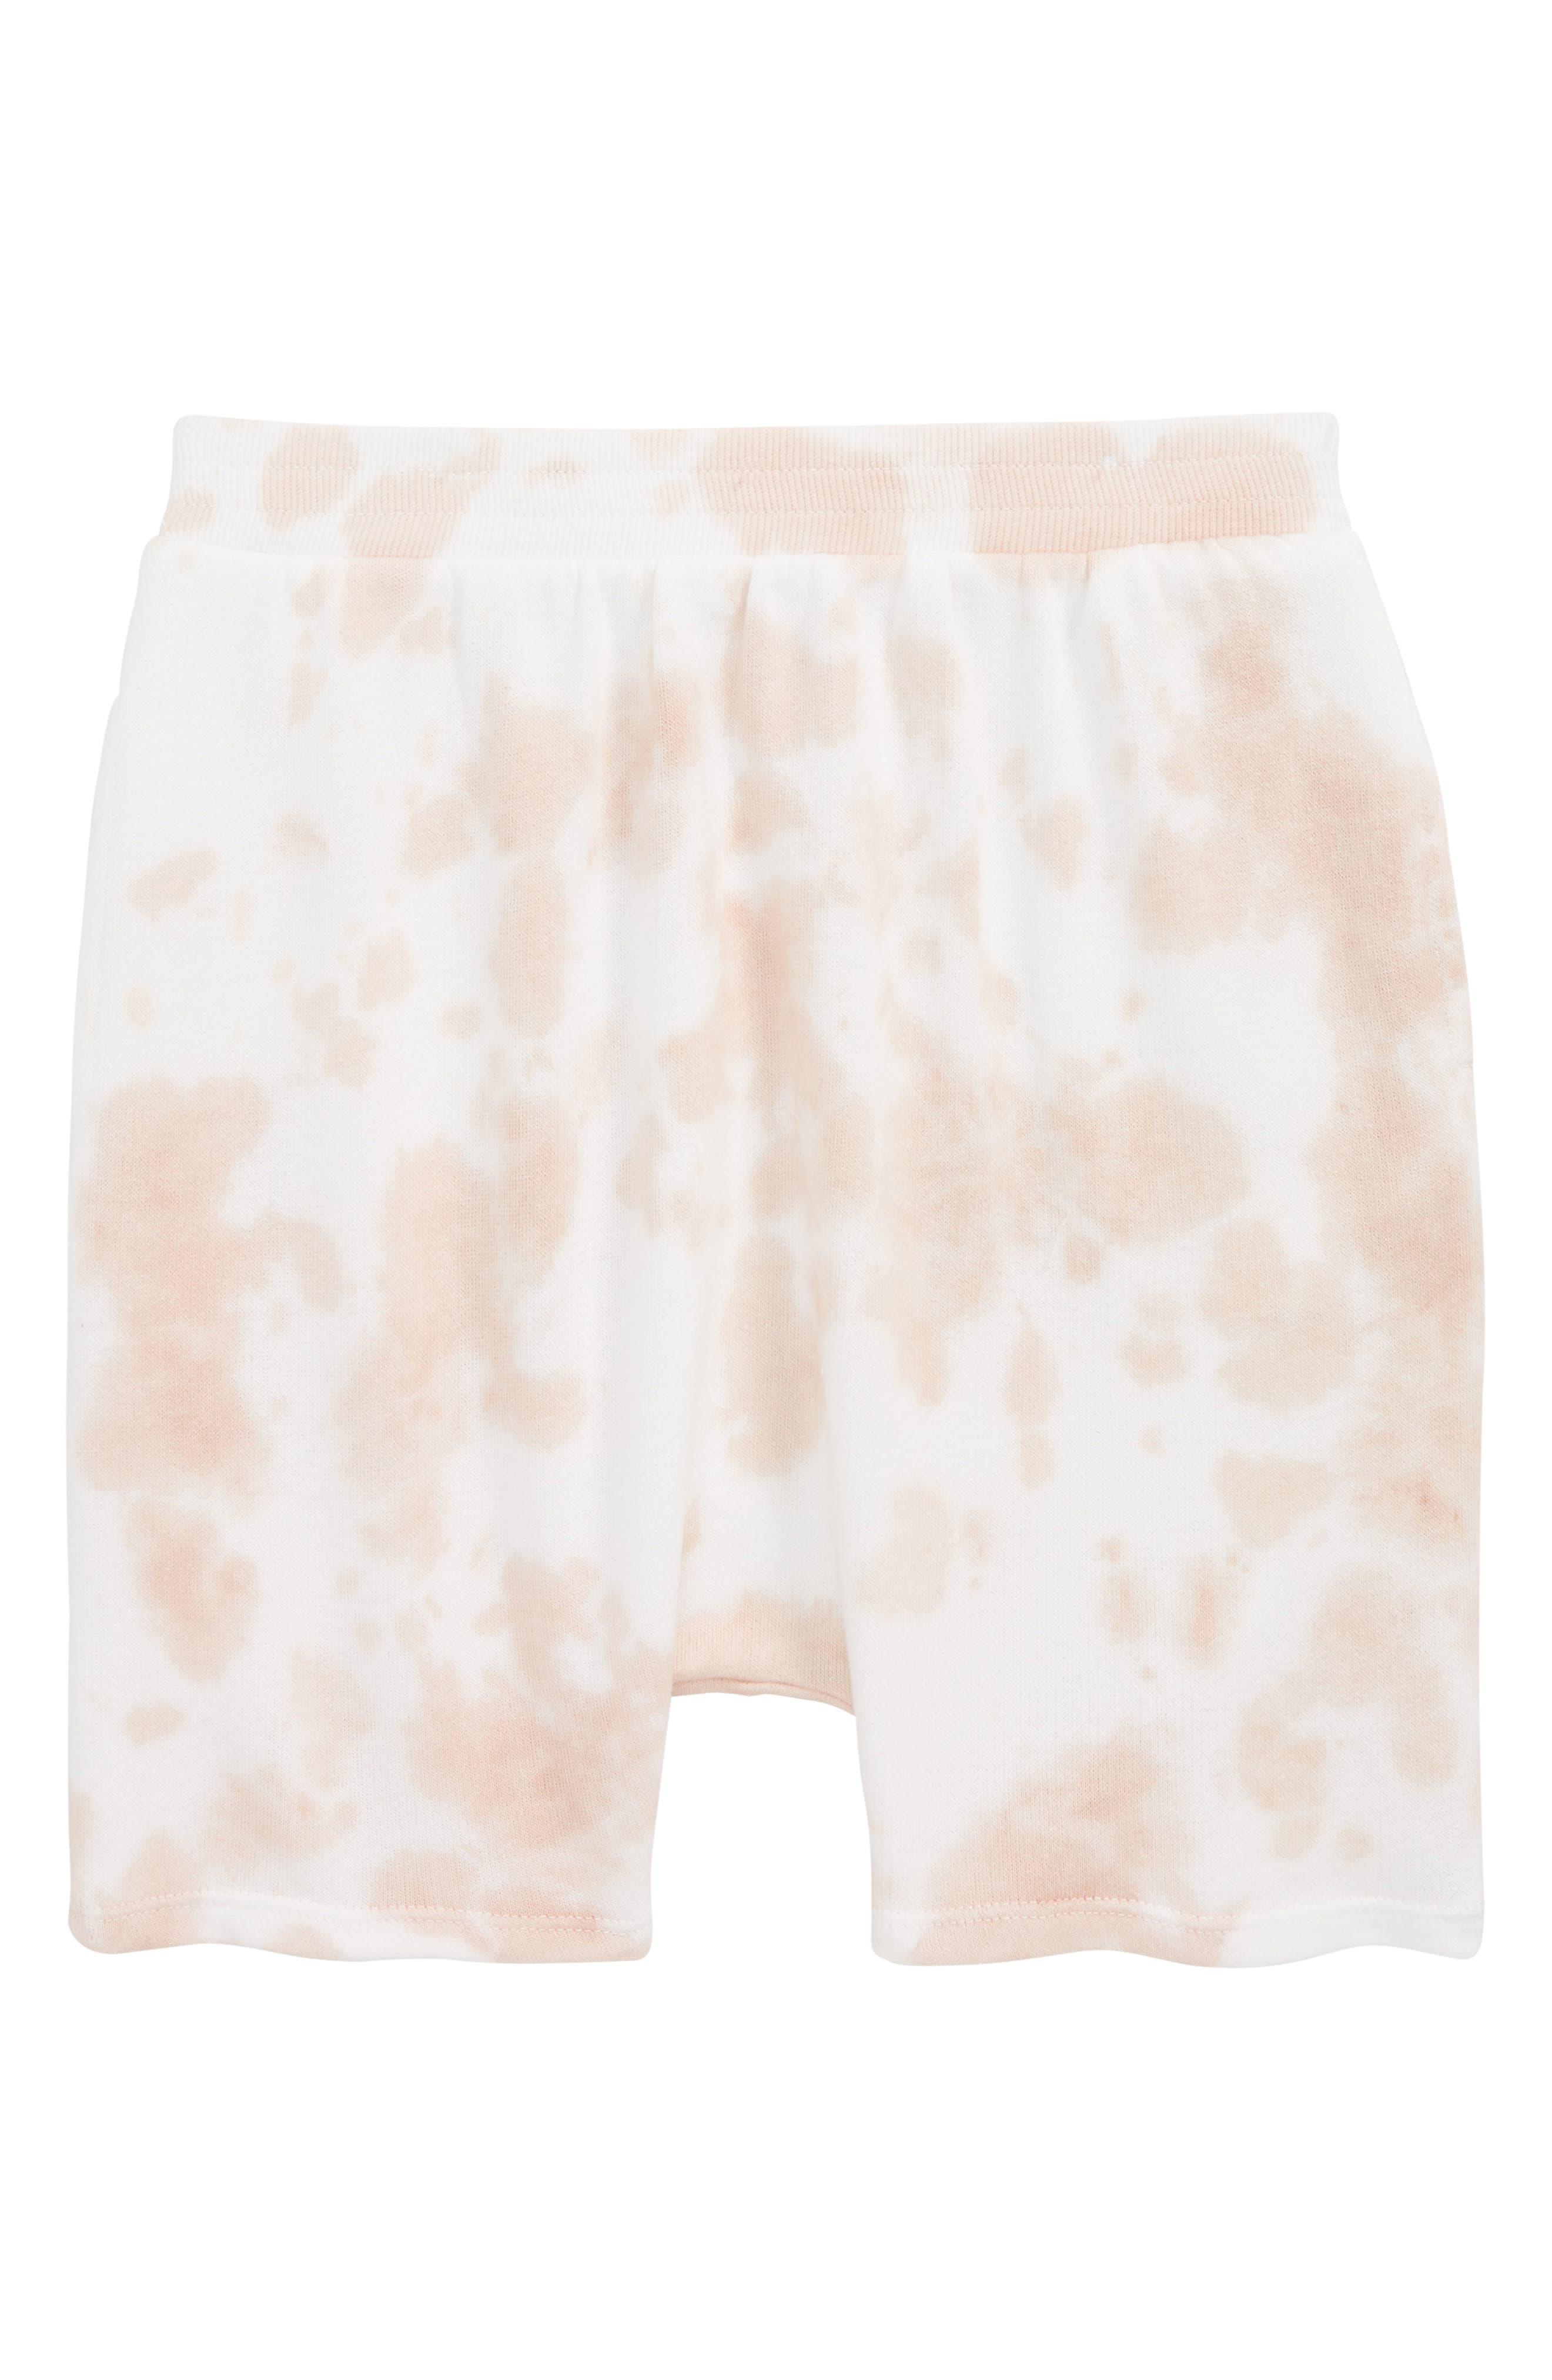 Alternate Image 1 Selected - Stem Tie Dye Shorts (Toddler Girls, Little Girls & Big Girls)